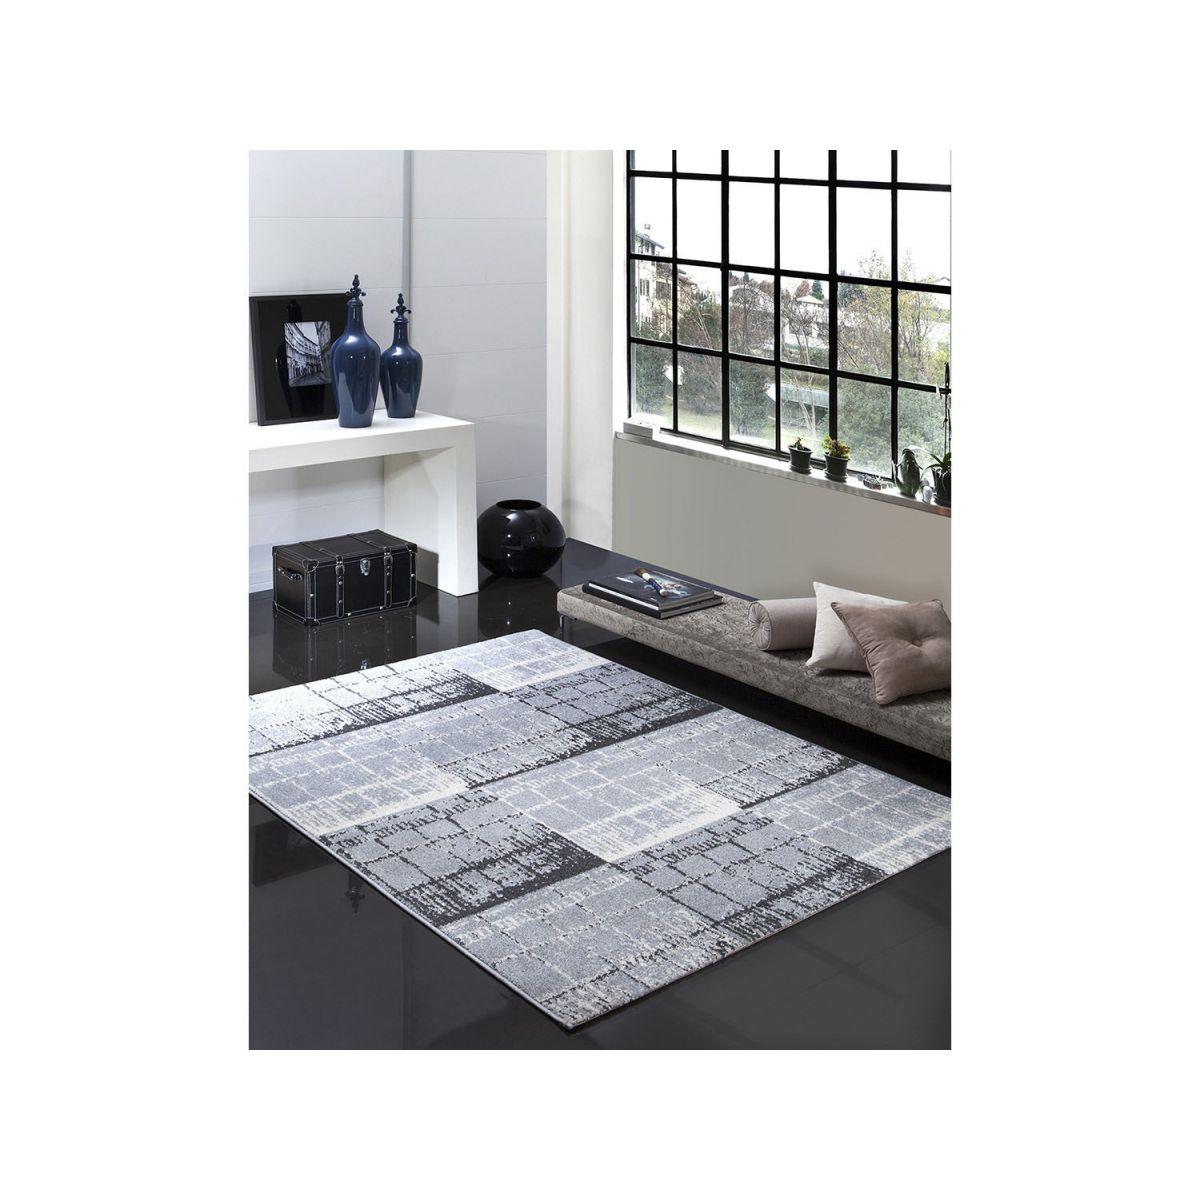 Tapete de sala e quarto tracy des2 a 2 00x2 50 m corttex for Esstisch 2 00 m